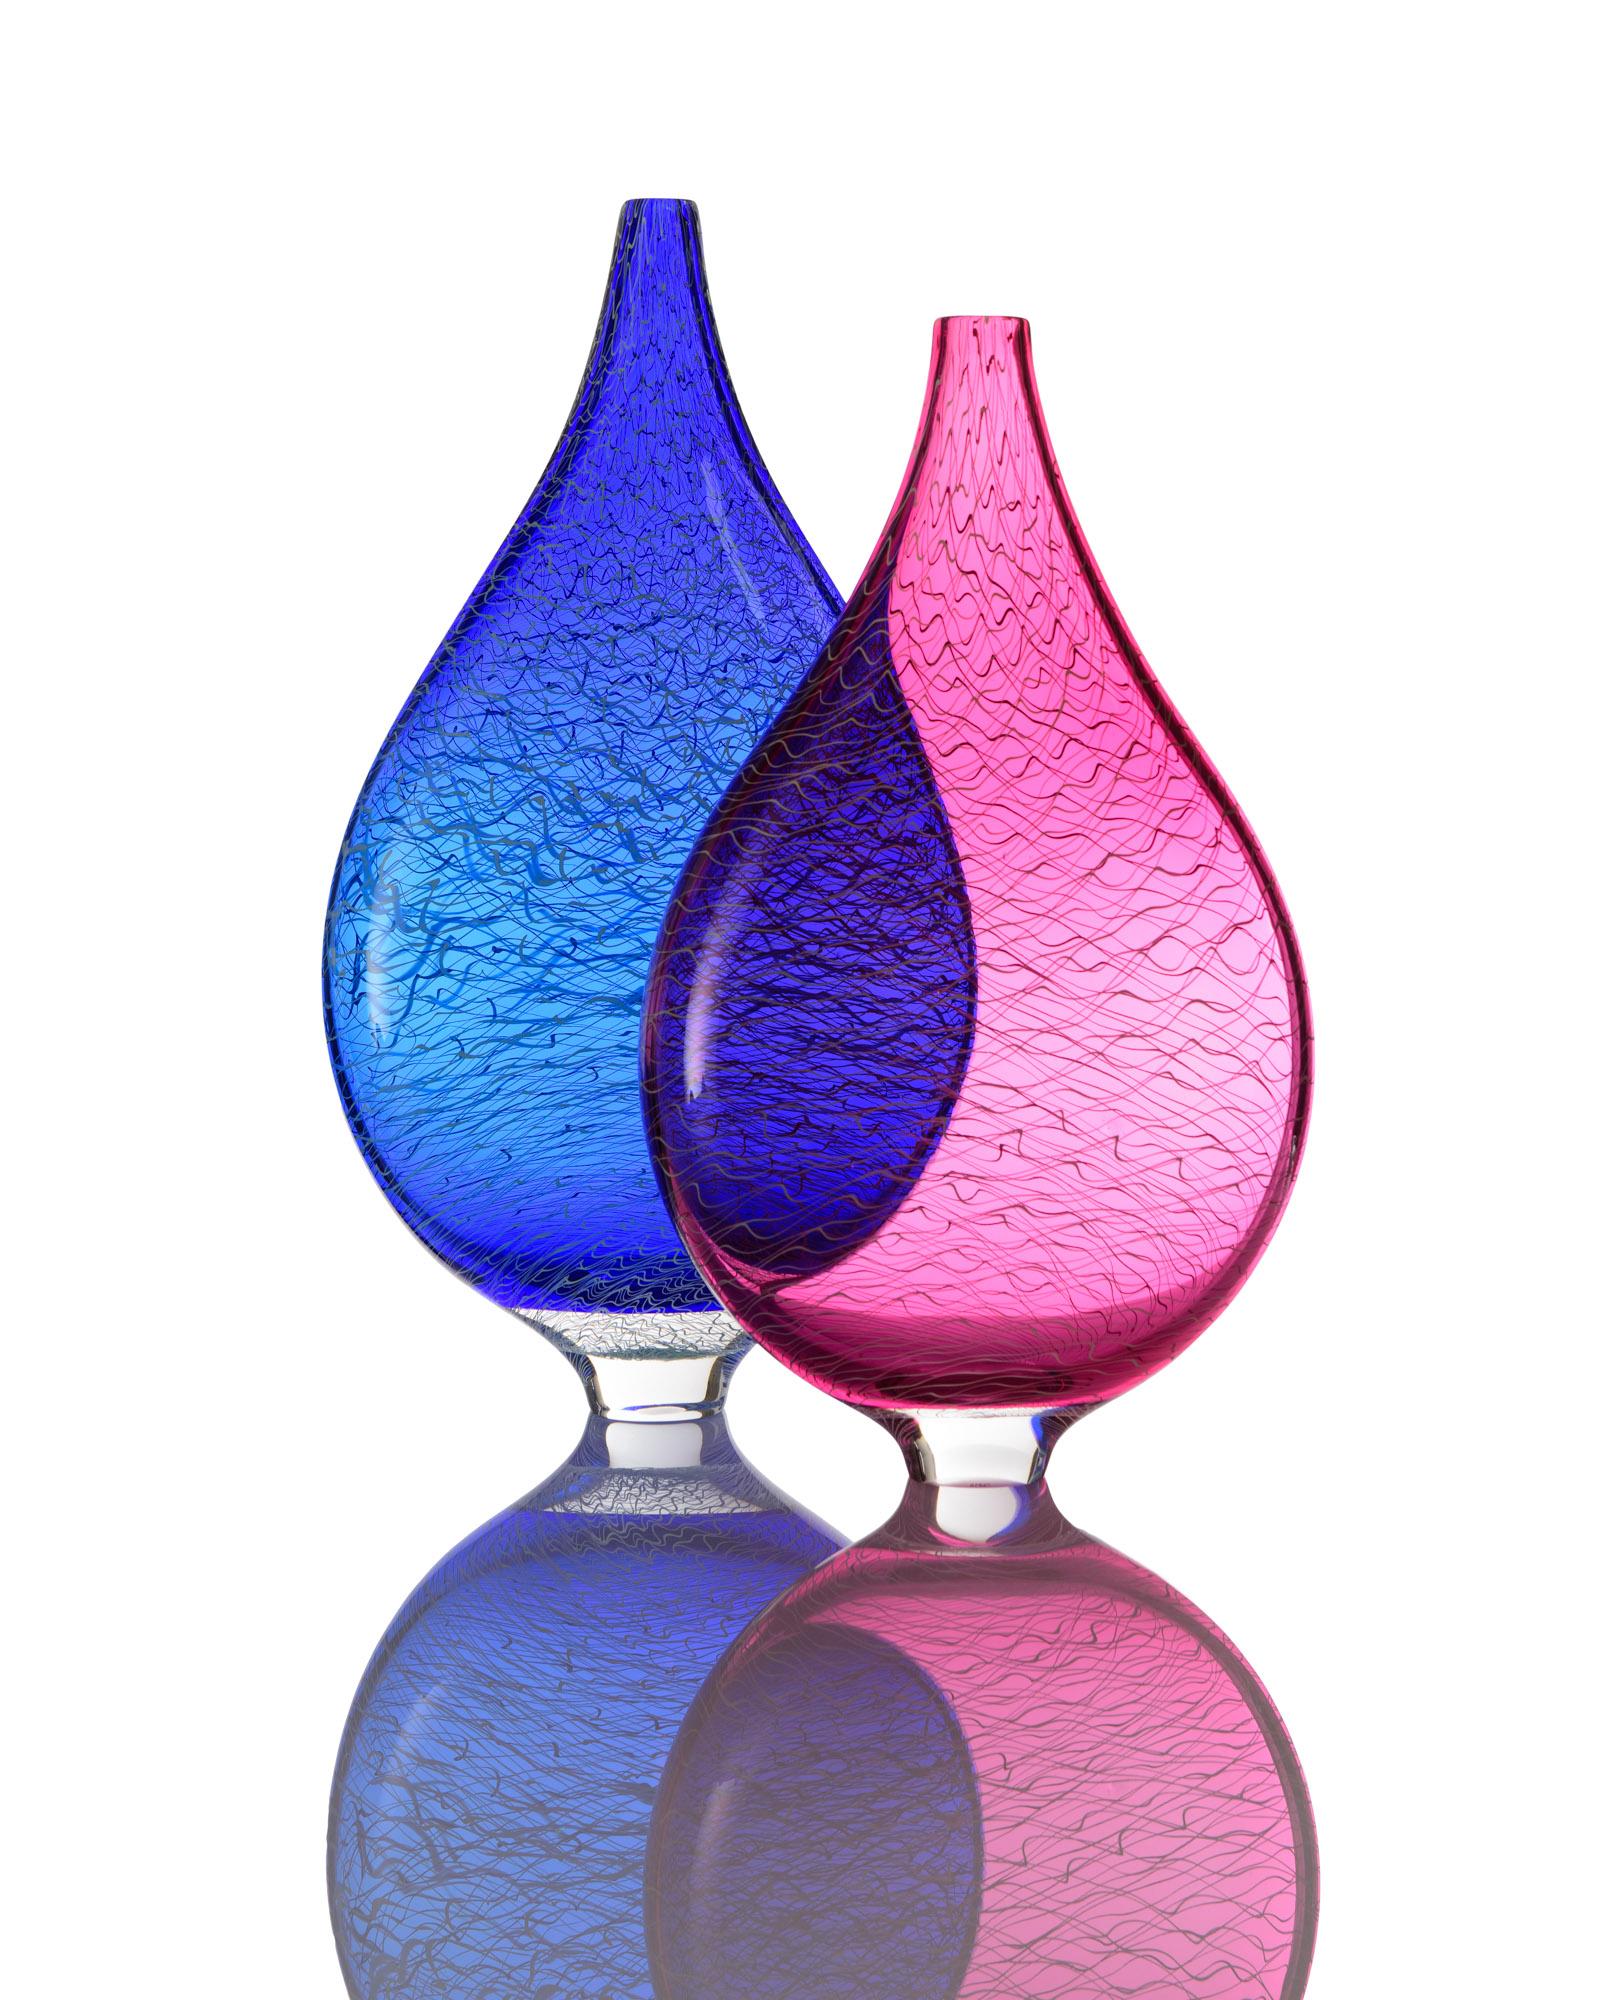 Marea Flat Vase Pair - Blue & Wine Red